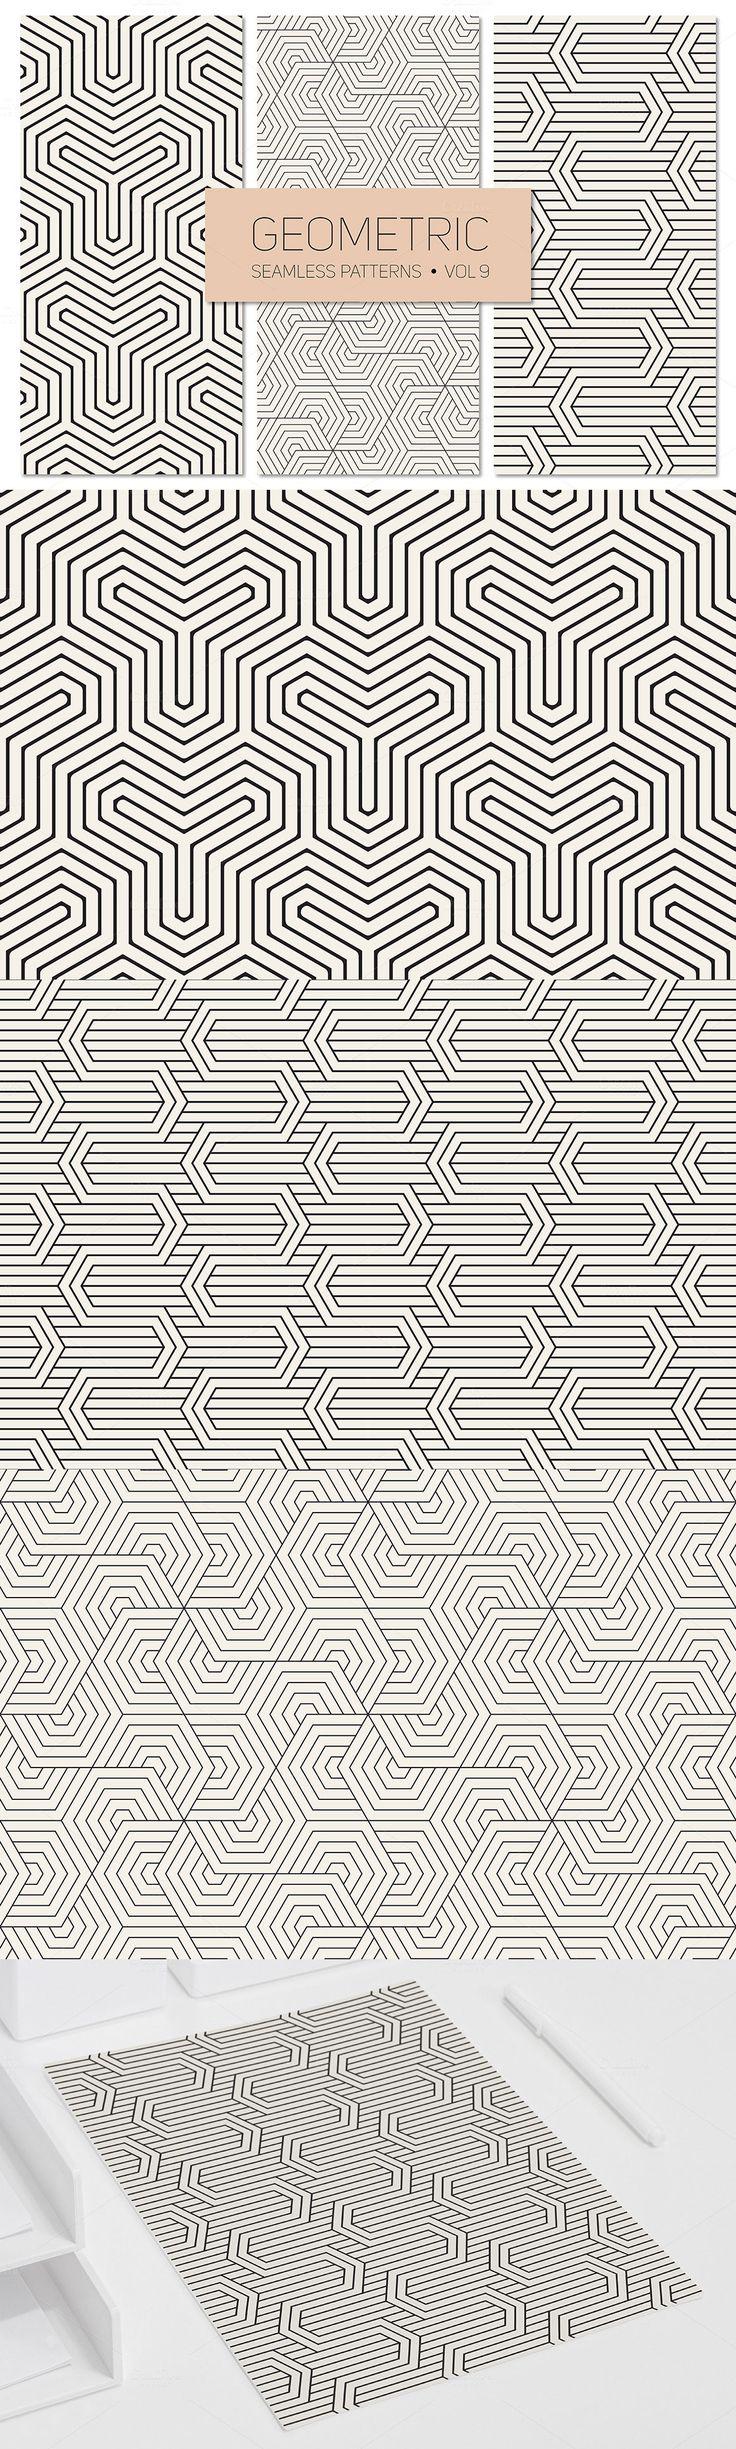 #Free #Geometric Seamless #Patterns  ( #creative #printable #vector #illustrations #art #freebies )